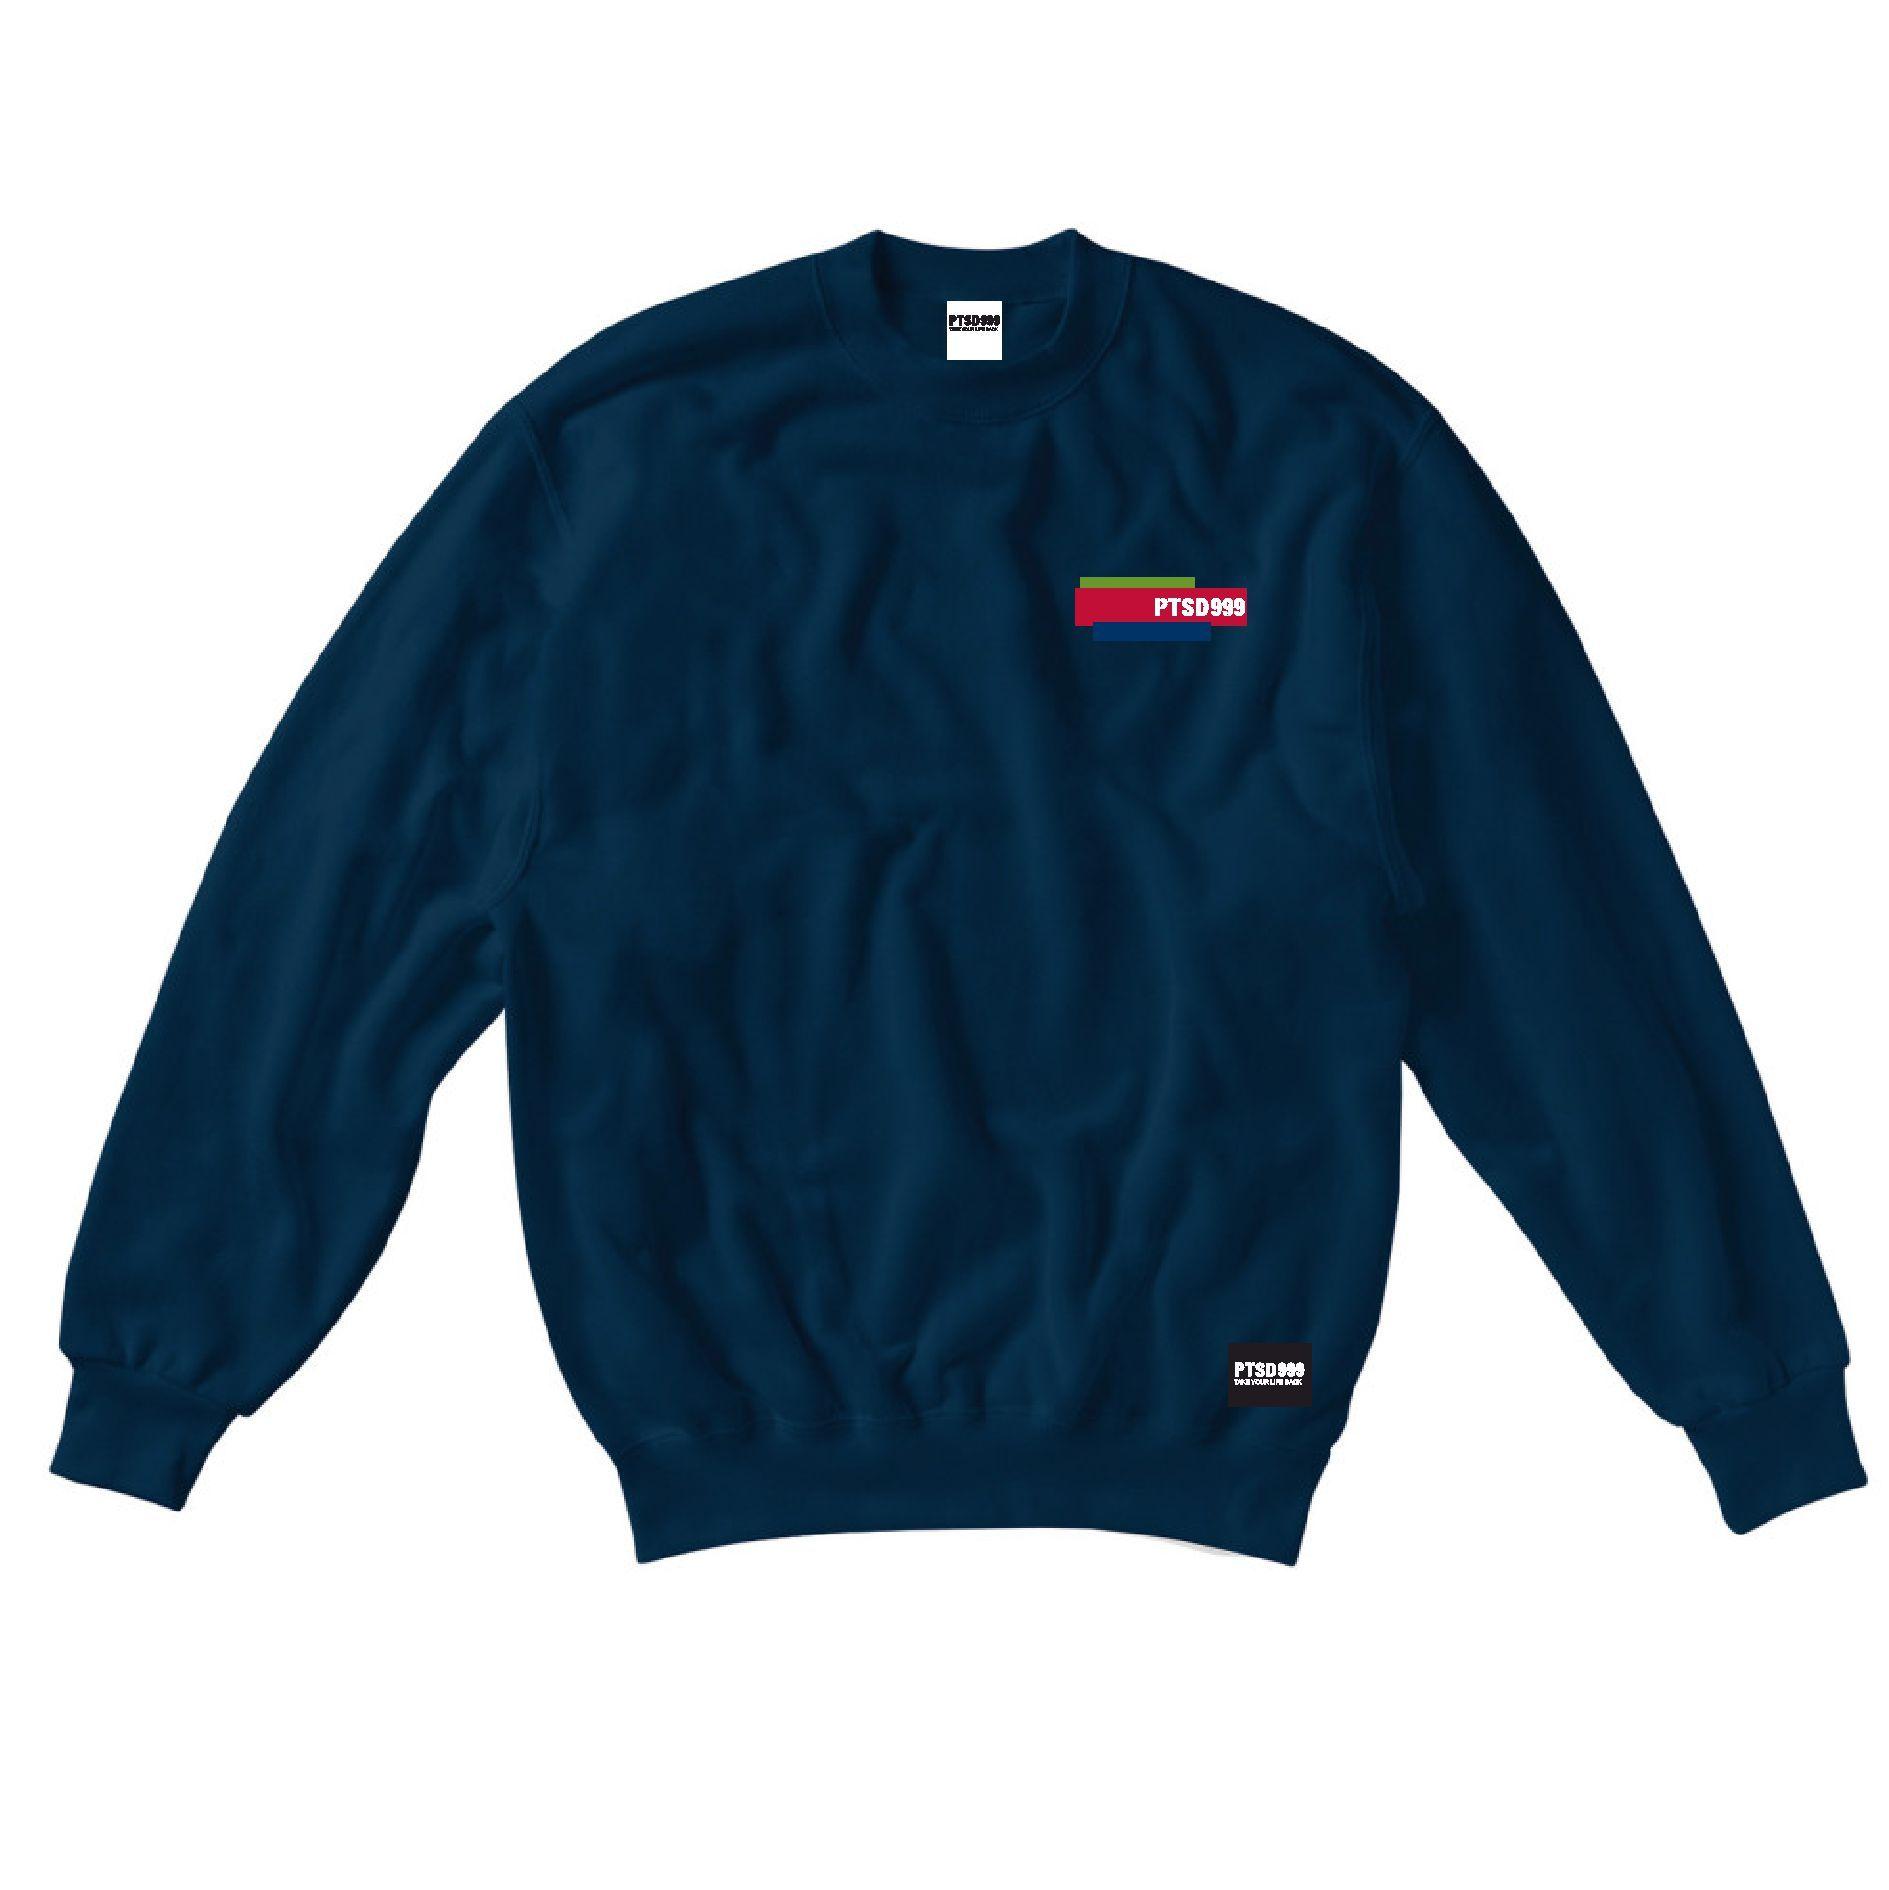 PTSD999- Original Sweatshirt (Kids)